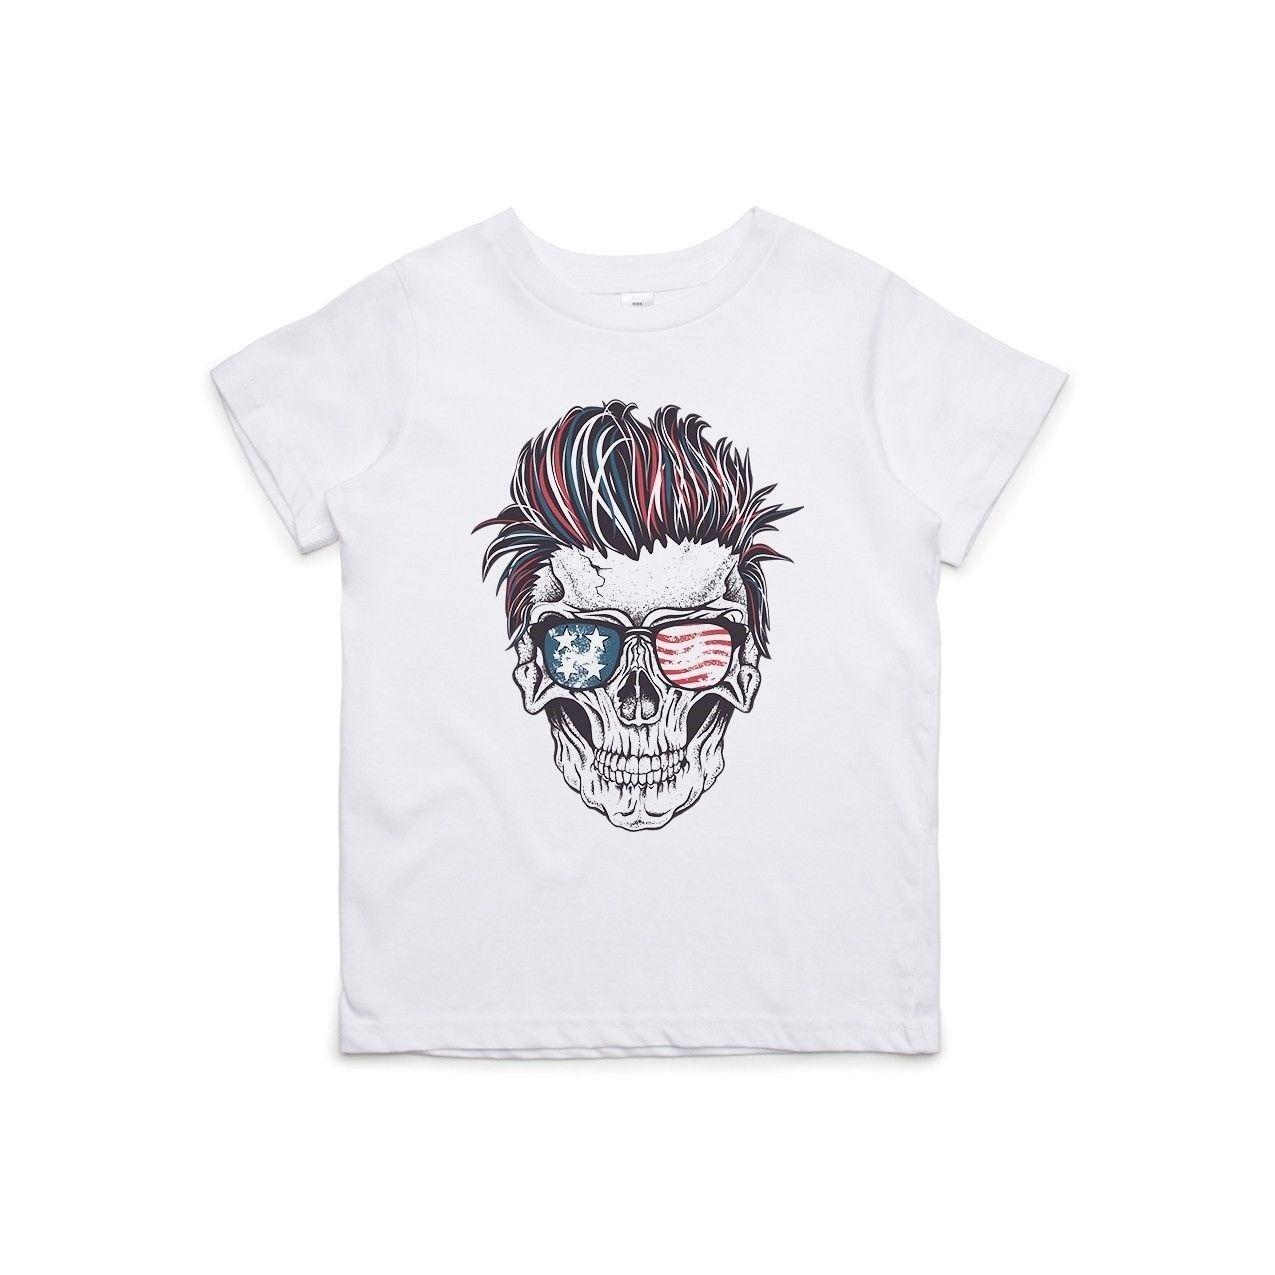 e00d3fe9 Patriotic Rocker Skull Kids T-Shirt Cool xxxtentacion marcus and martinus  tshirt discout hot new top free shipping